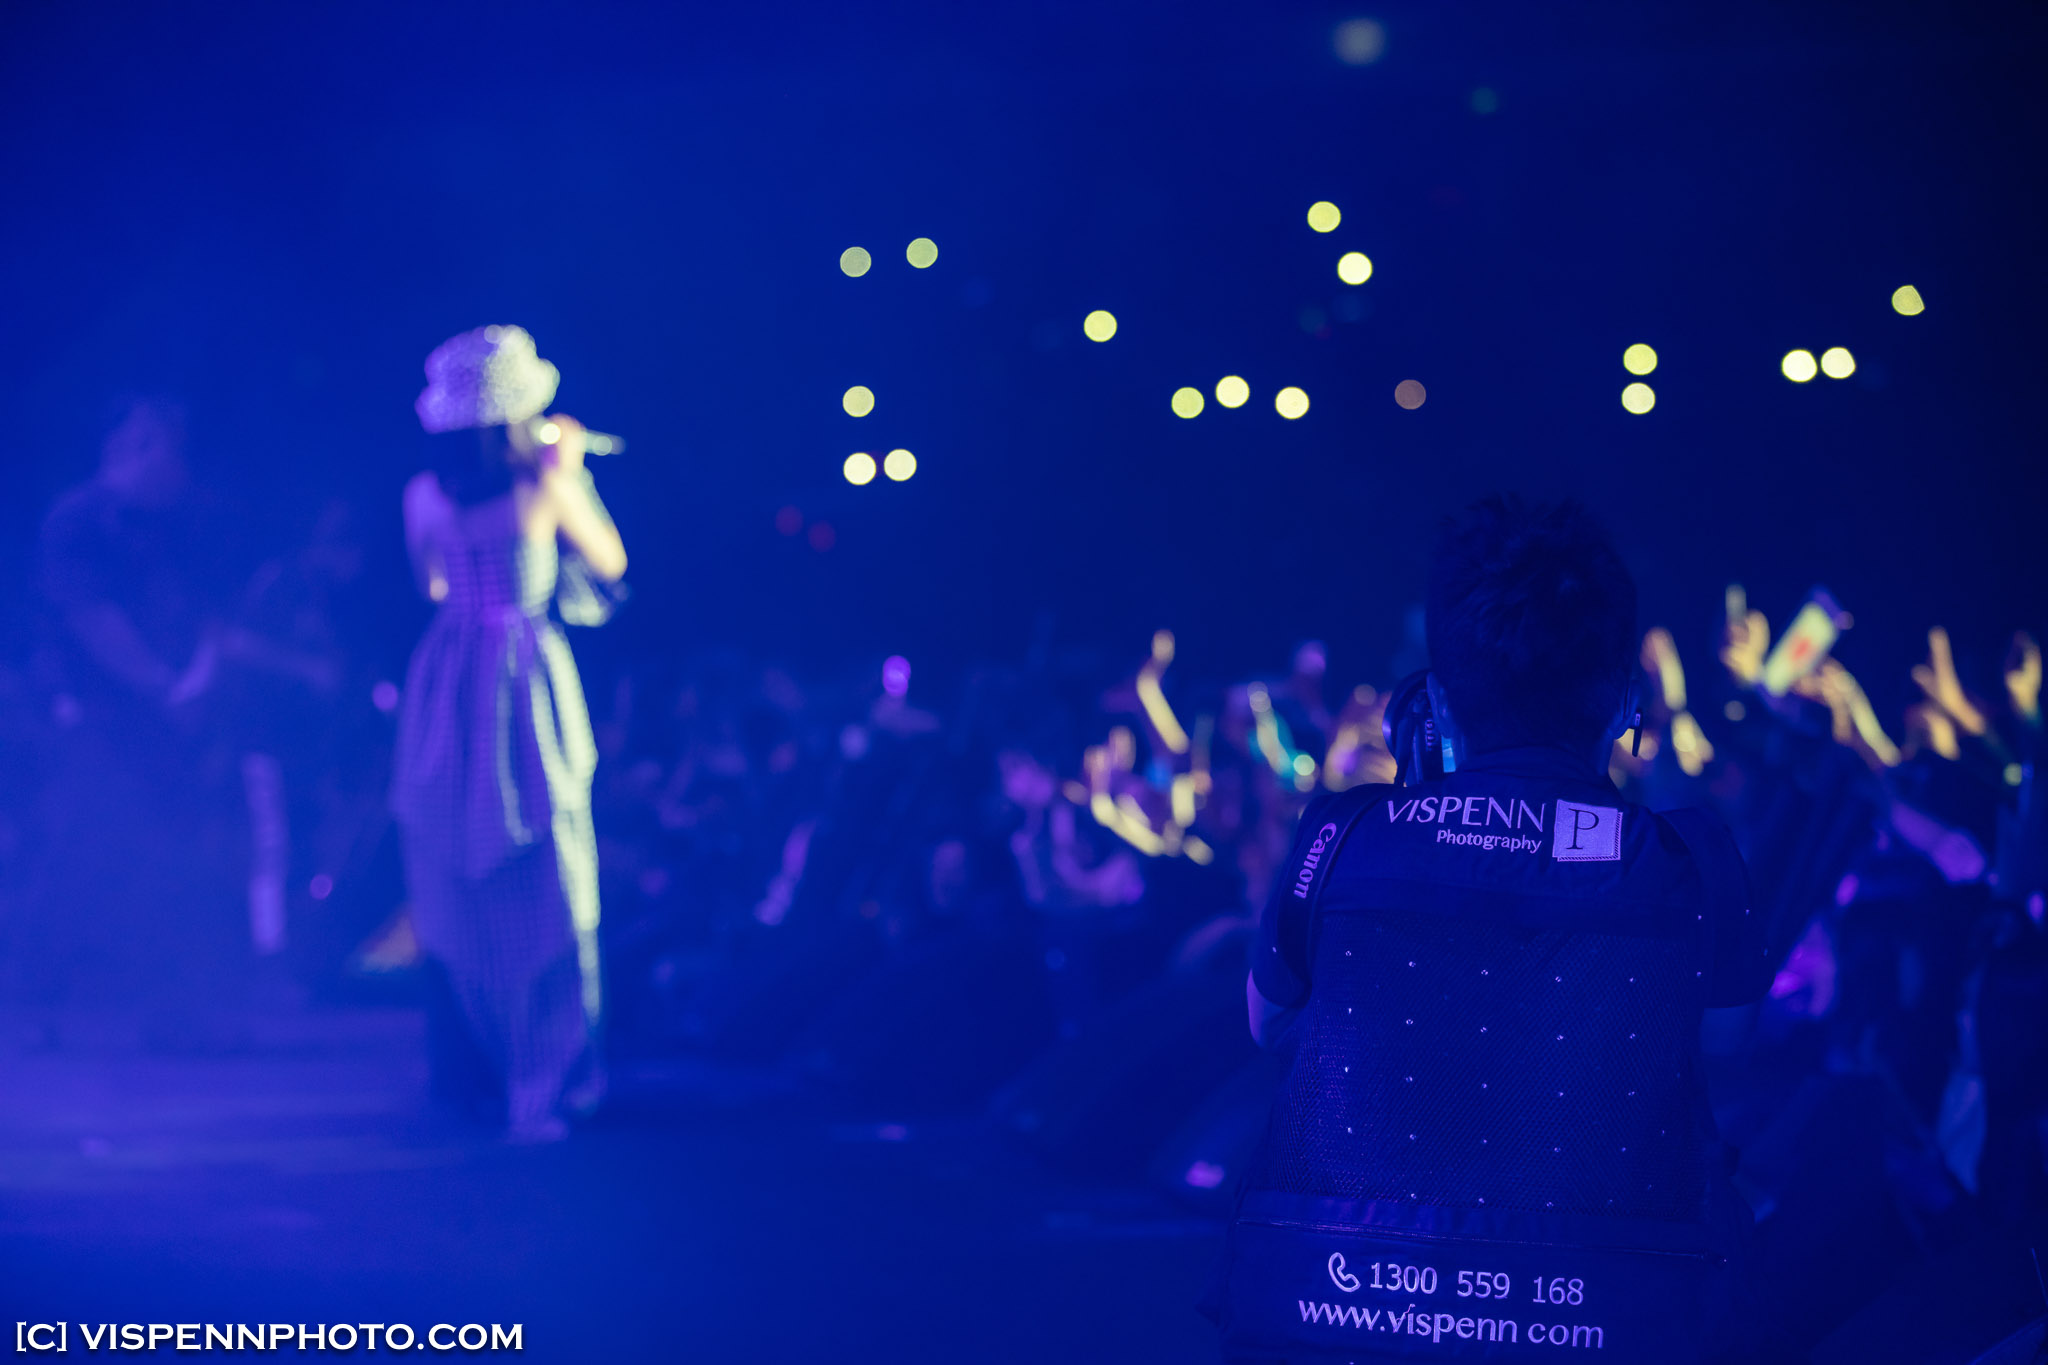 Melbourne CONCERTS Photography 墨尔本 演唱会 照片 摄影师 VISPENN AngelaZhang 4H 9224 5D4 VISPENN